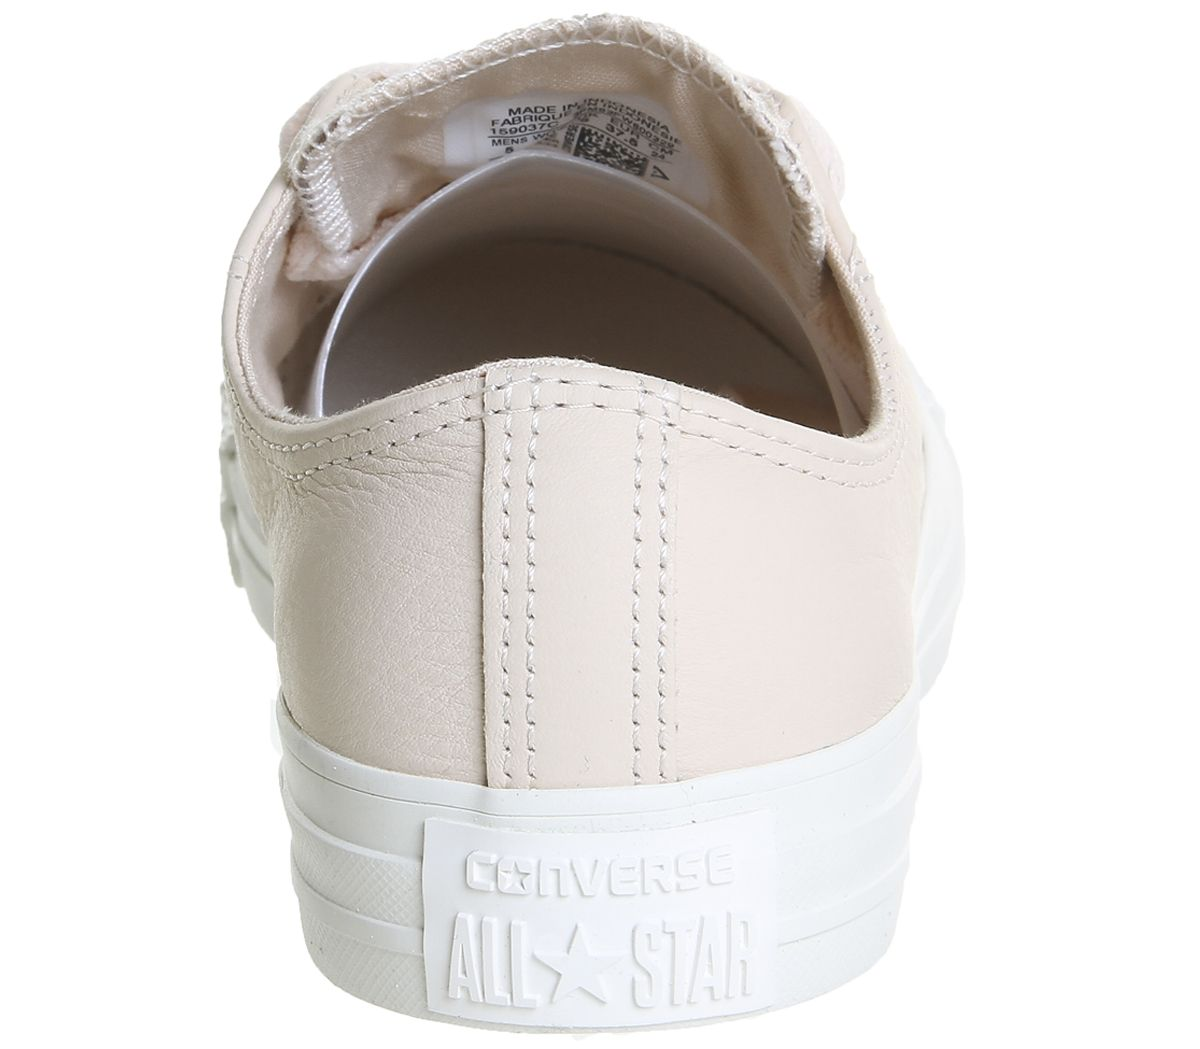 32b9110db4c49 Converse All Star Low Leather Egret Pastel Rose Tan Blush Gold ...